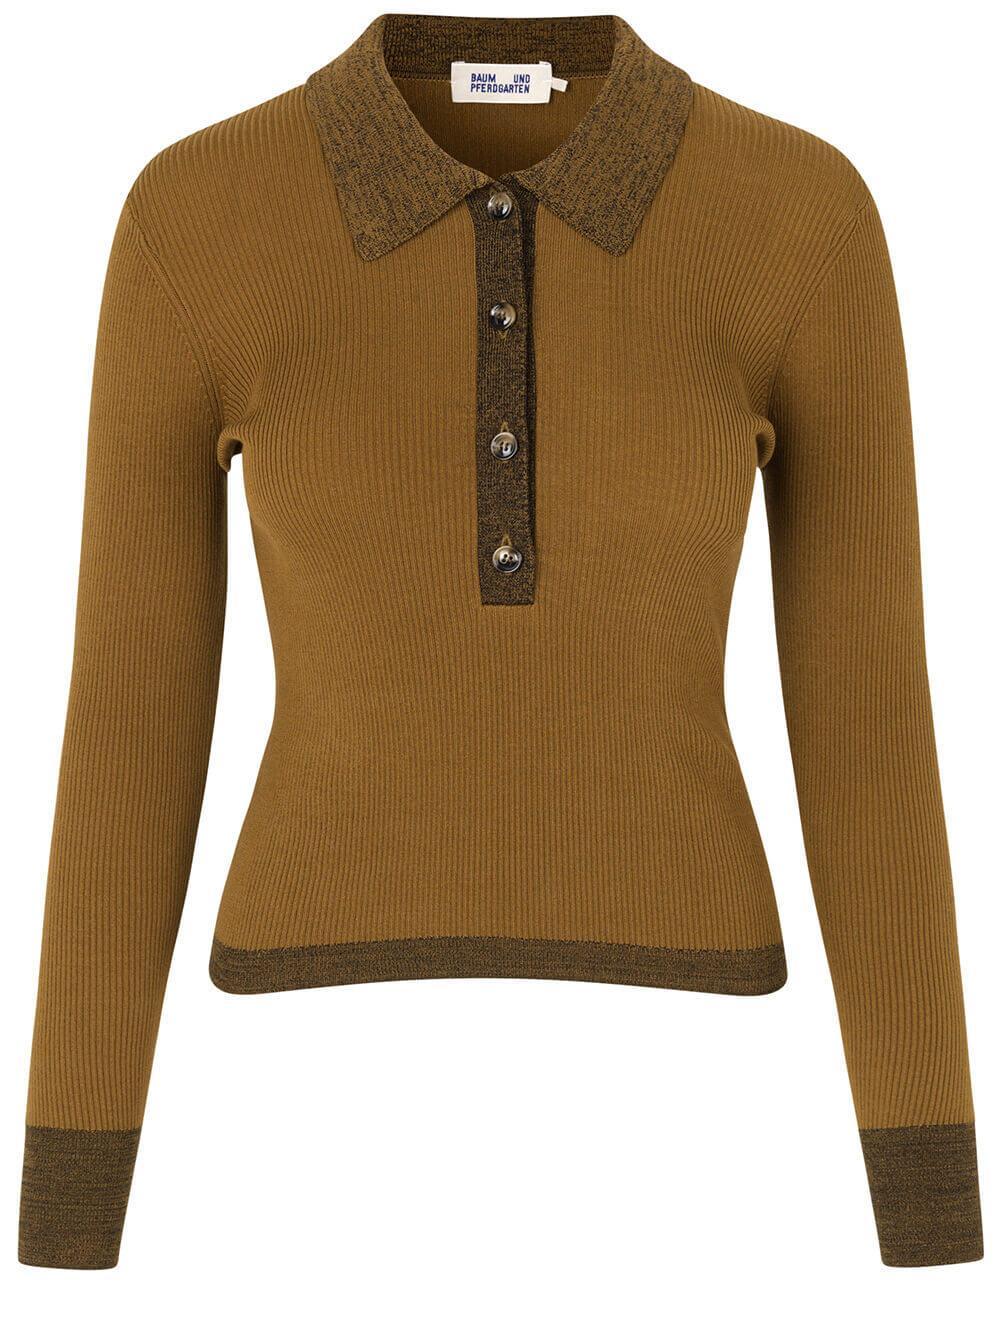 Clariette Knit Polo Top Item # 21965